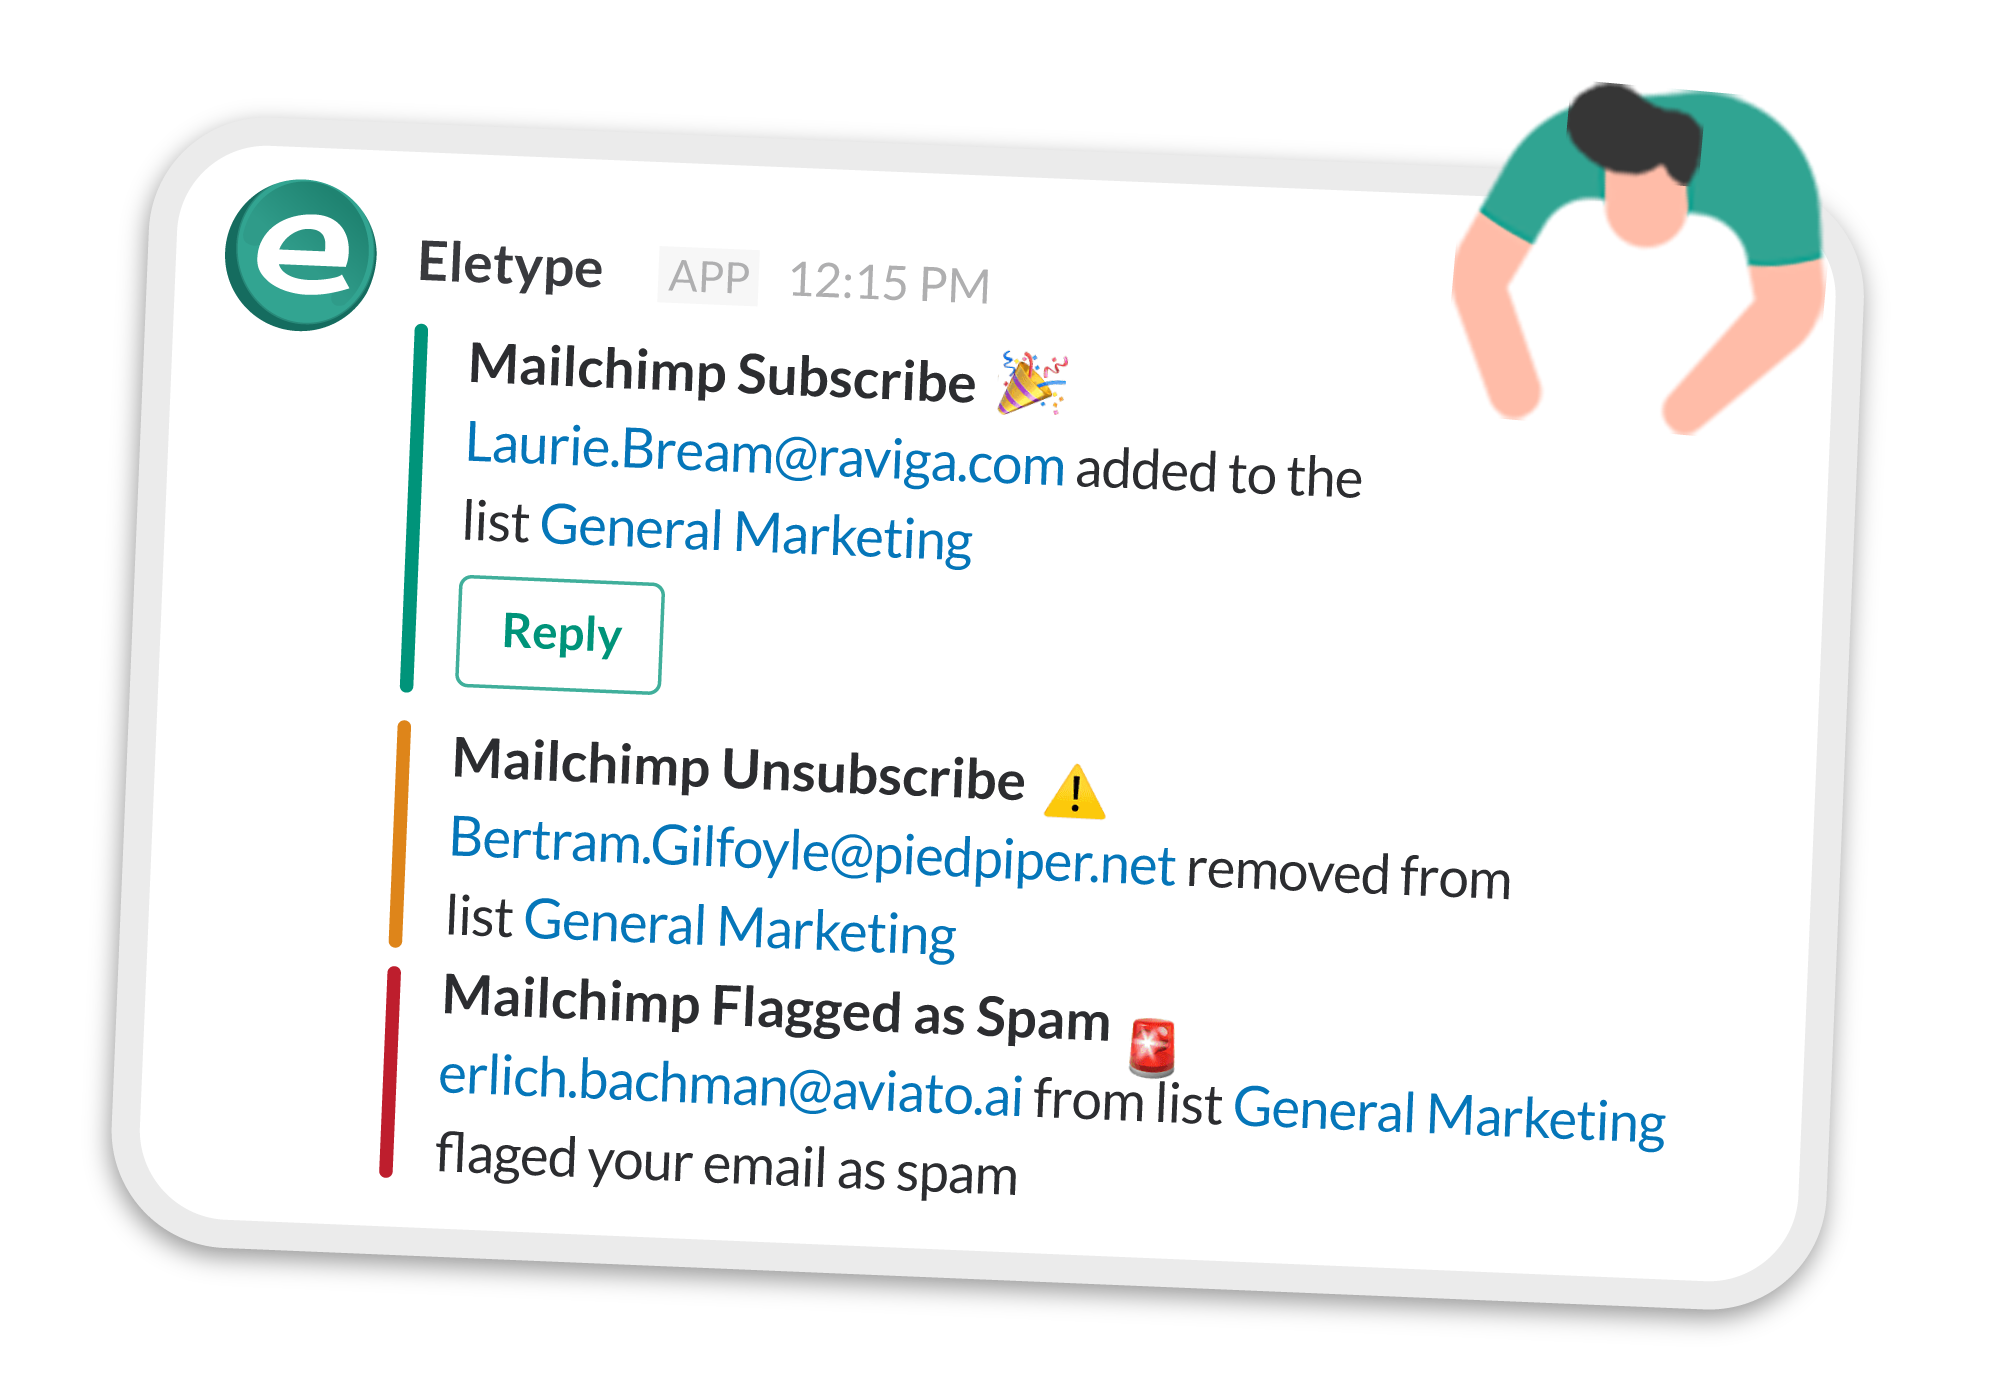 mailchimp realtime notifications in slack